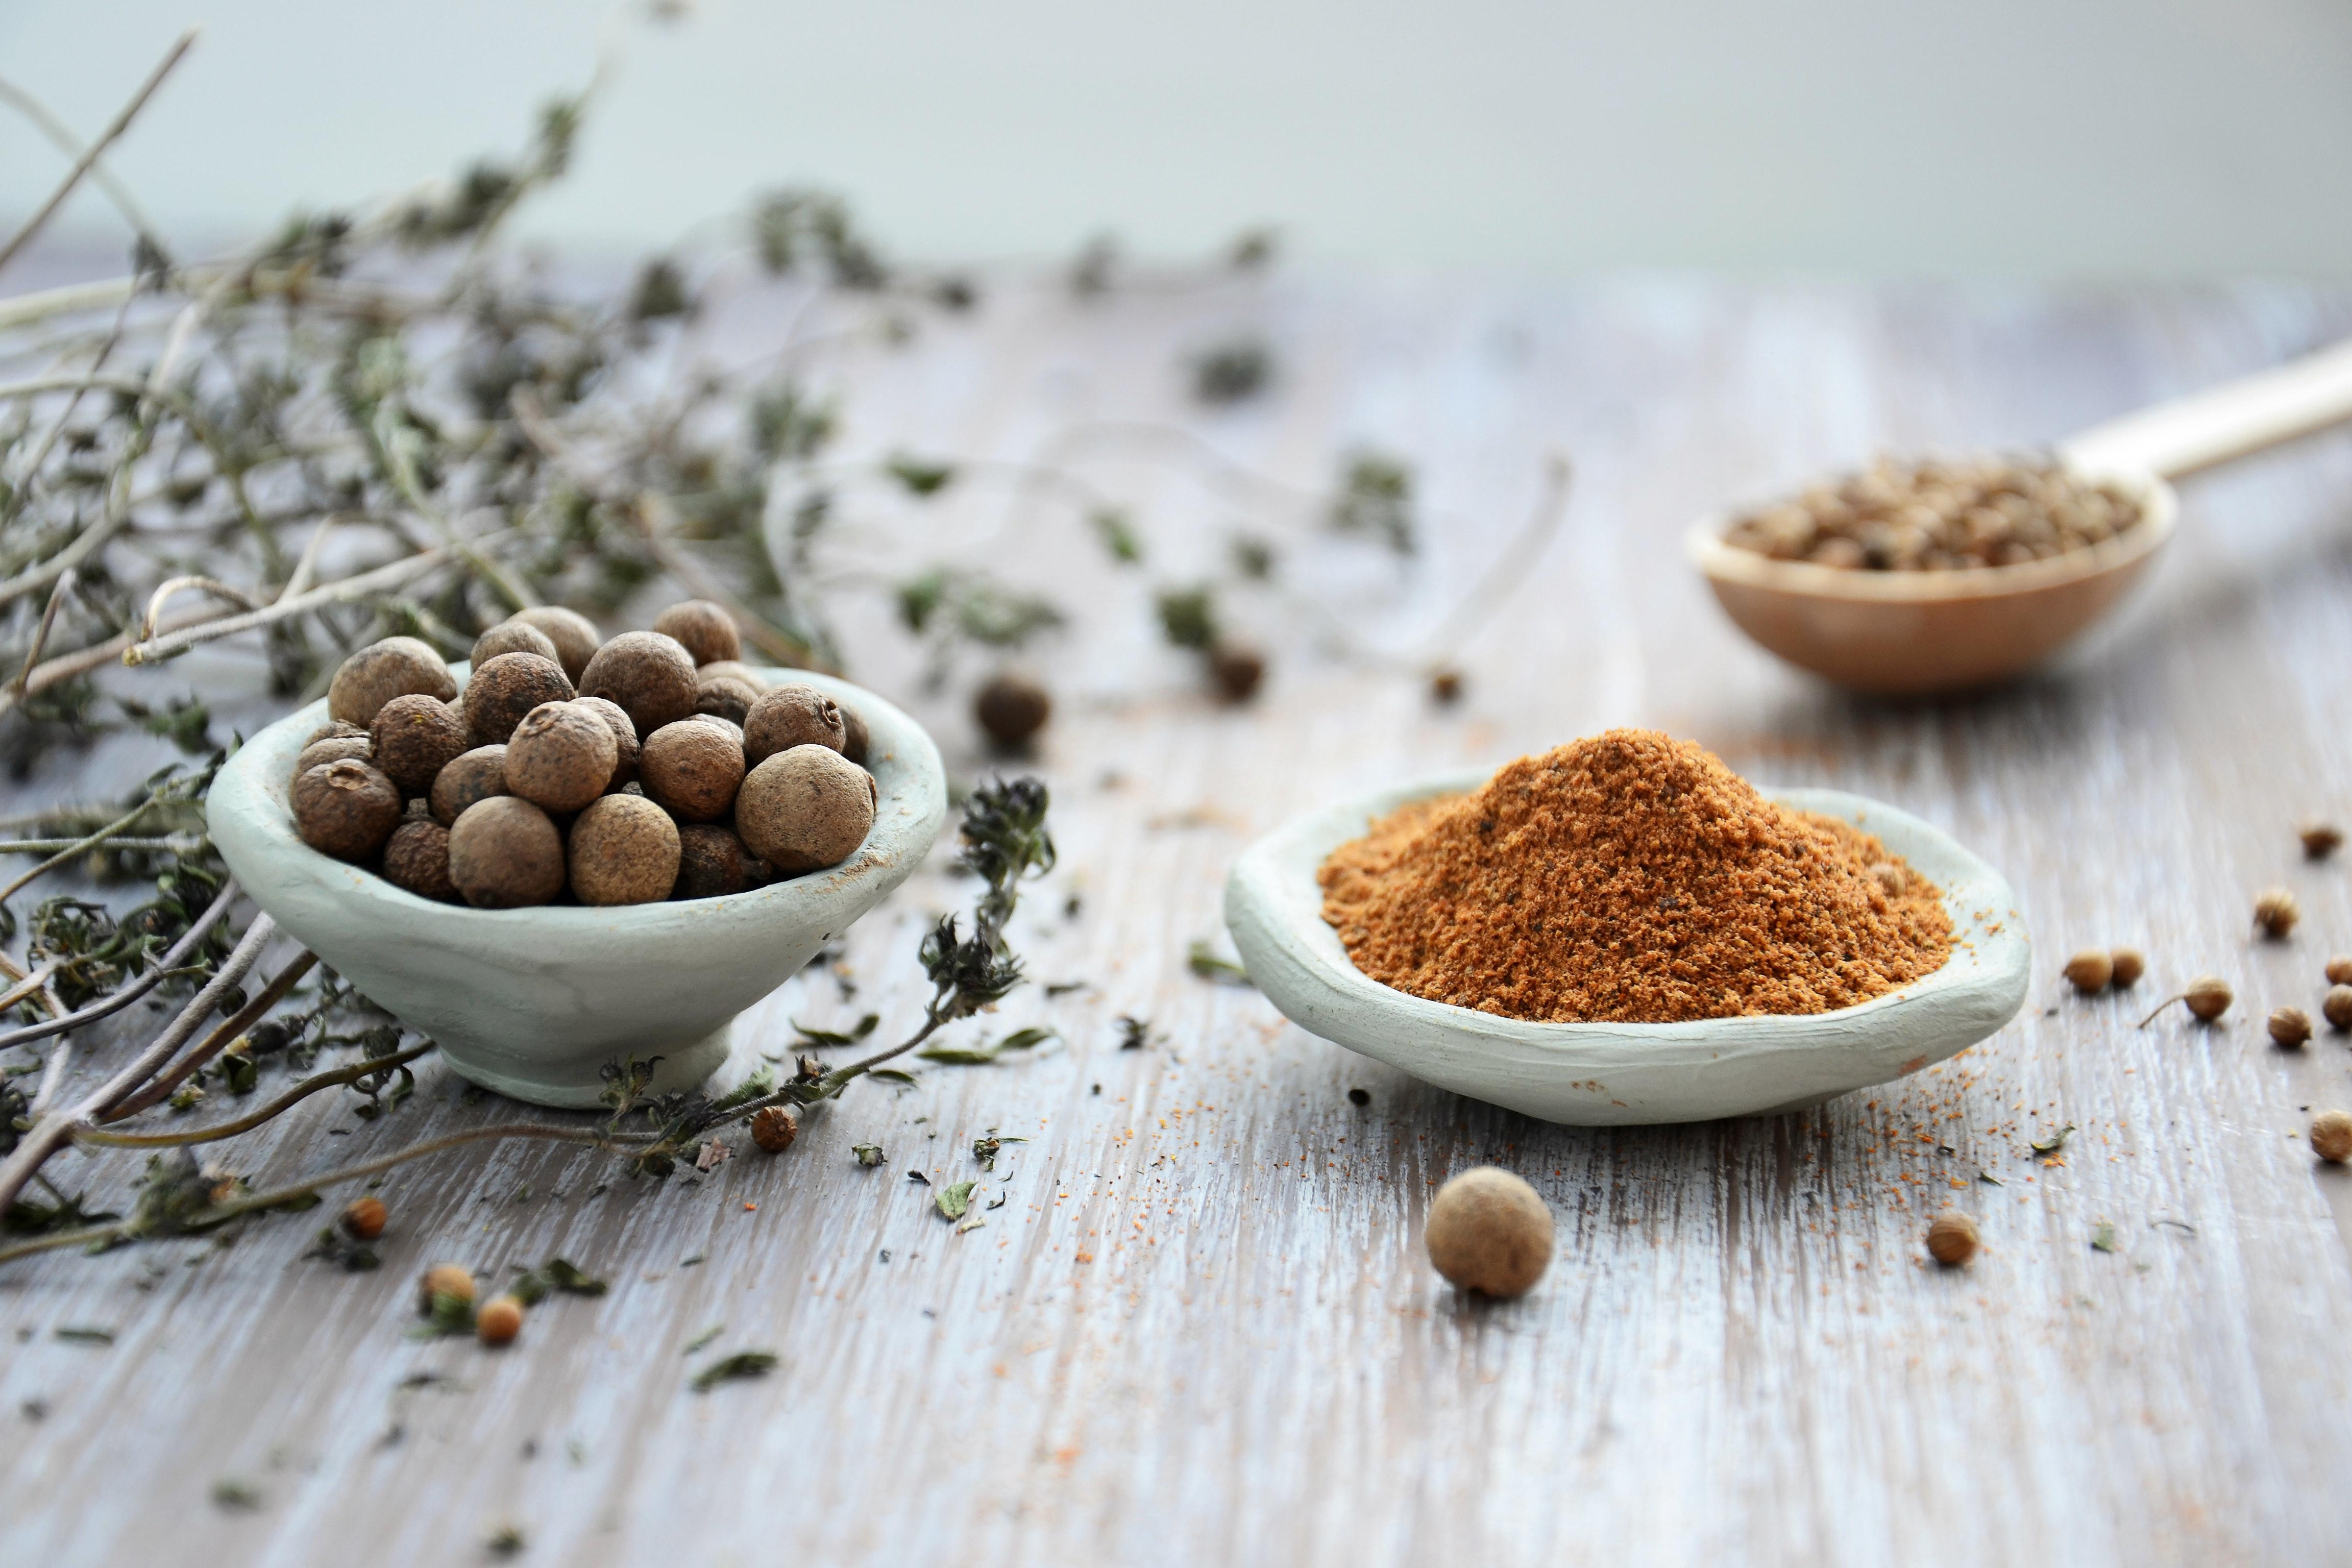 Naturliga ingredienser på bord